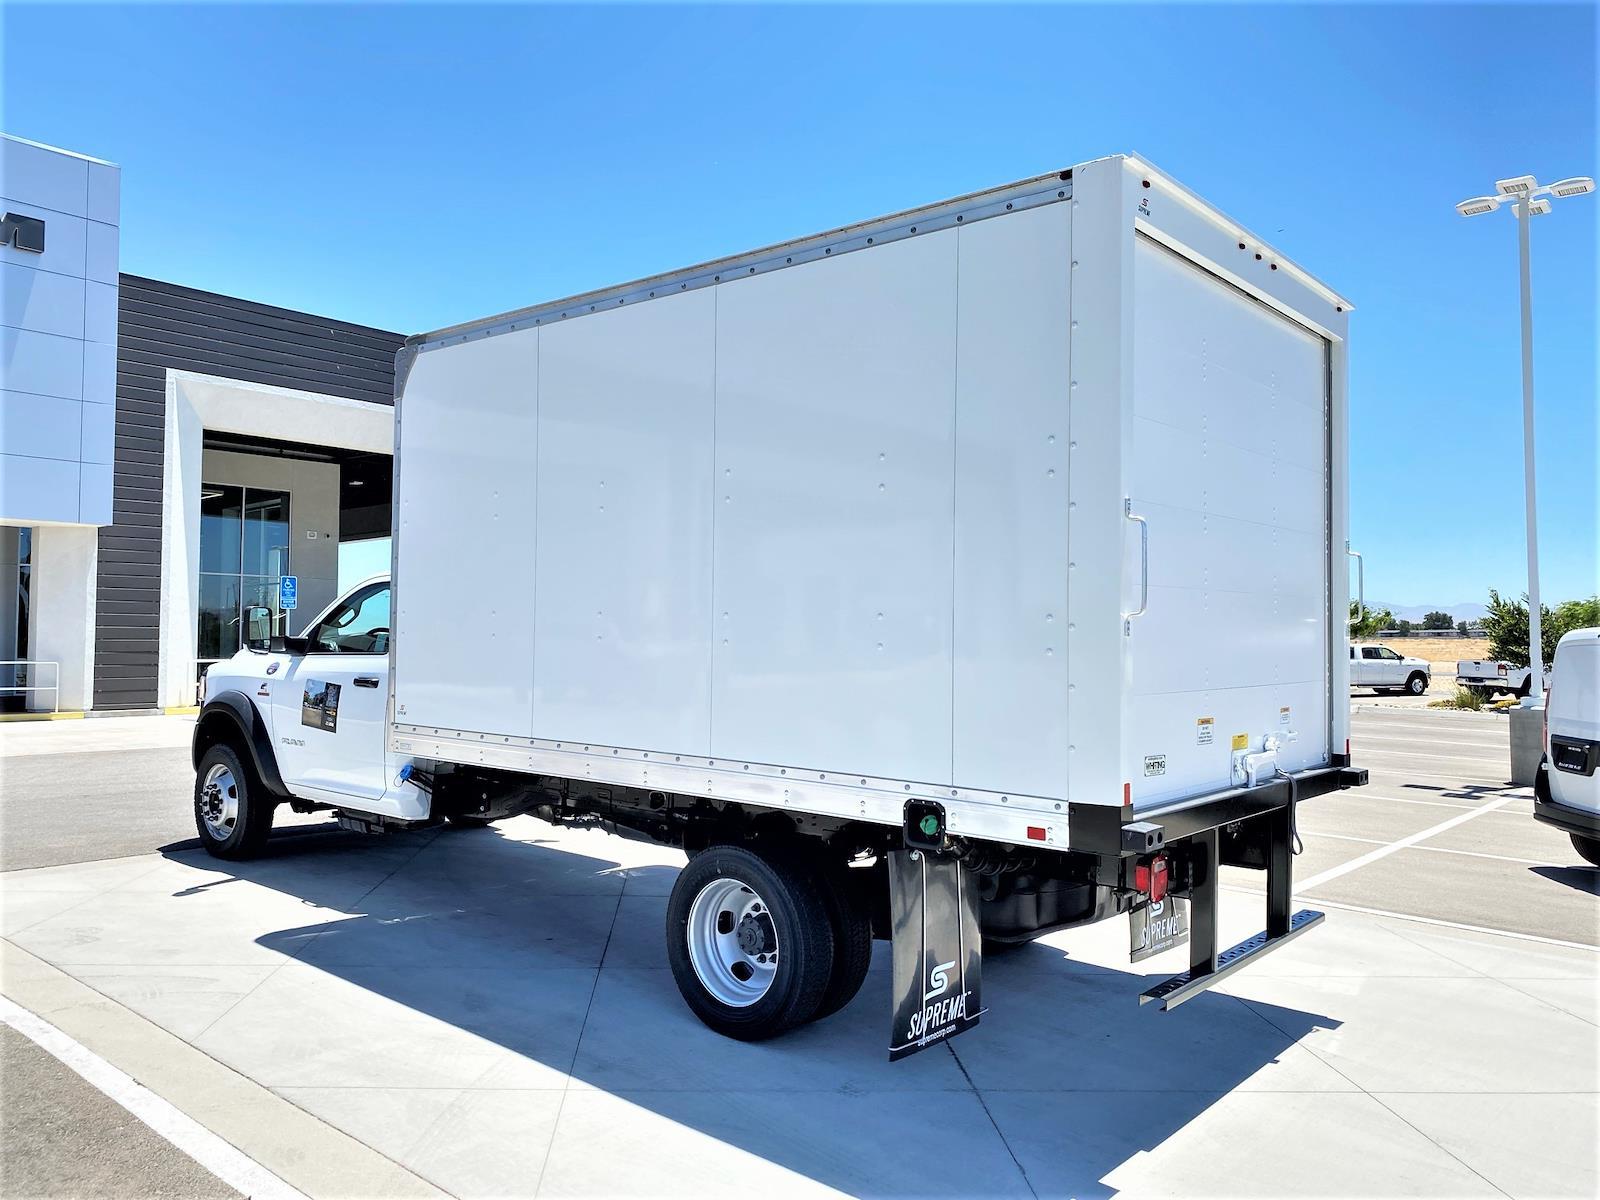 2020 Ram 5500 Regular Cab DRW 4x2, Supreme Iner-City Dry Freight #XCC53640 - photo 4